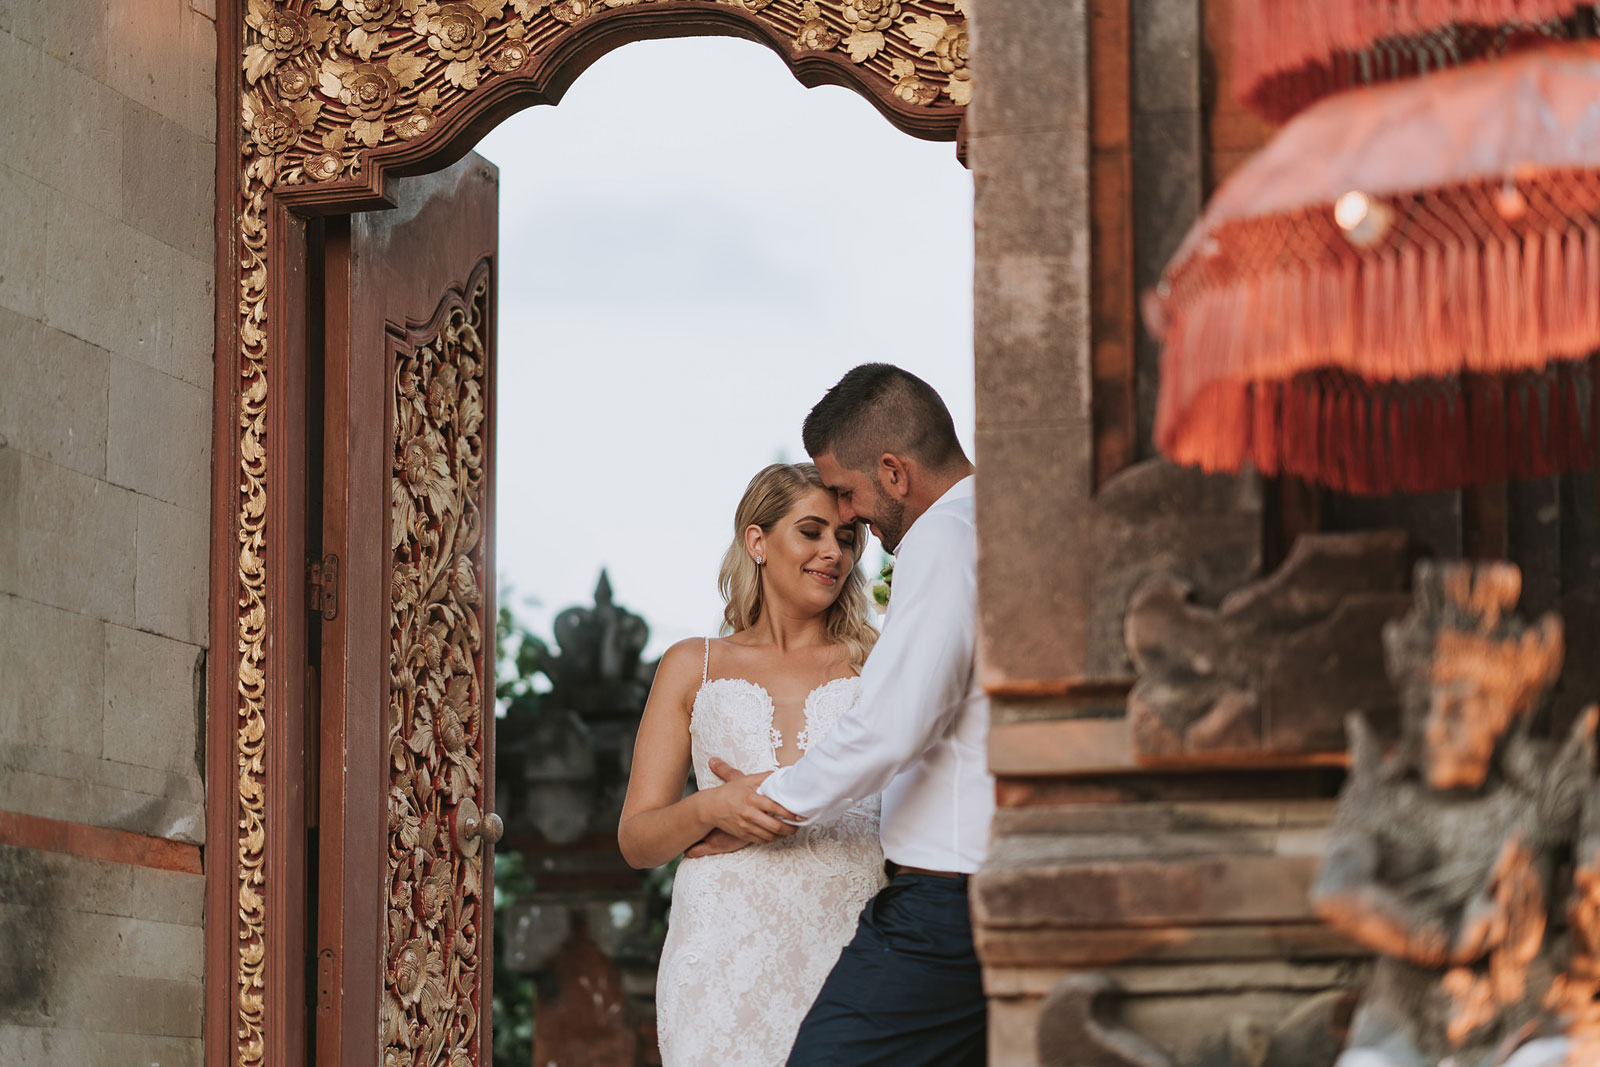 newfound-j-j-bali-nusa-dua-wedding-wedding-photographer-068-a